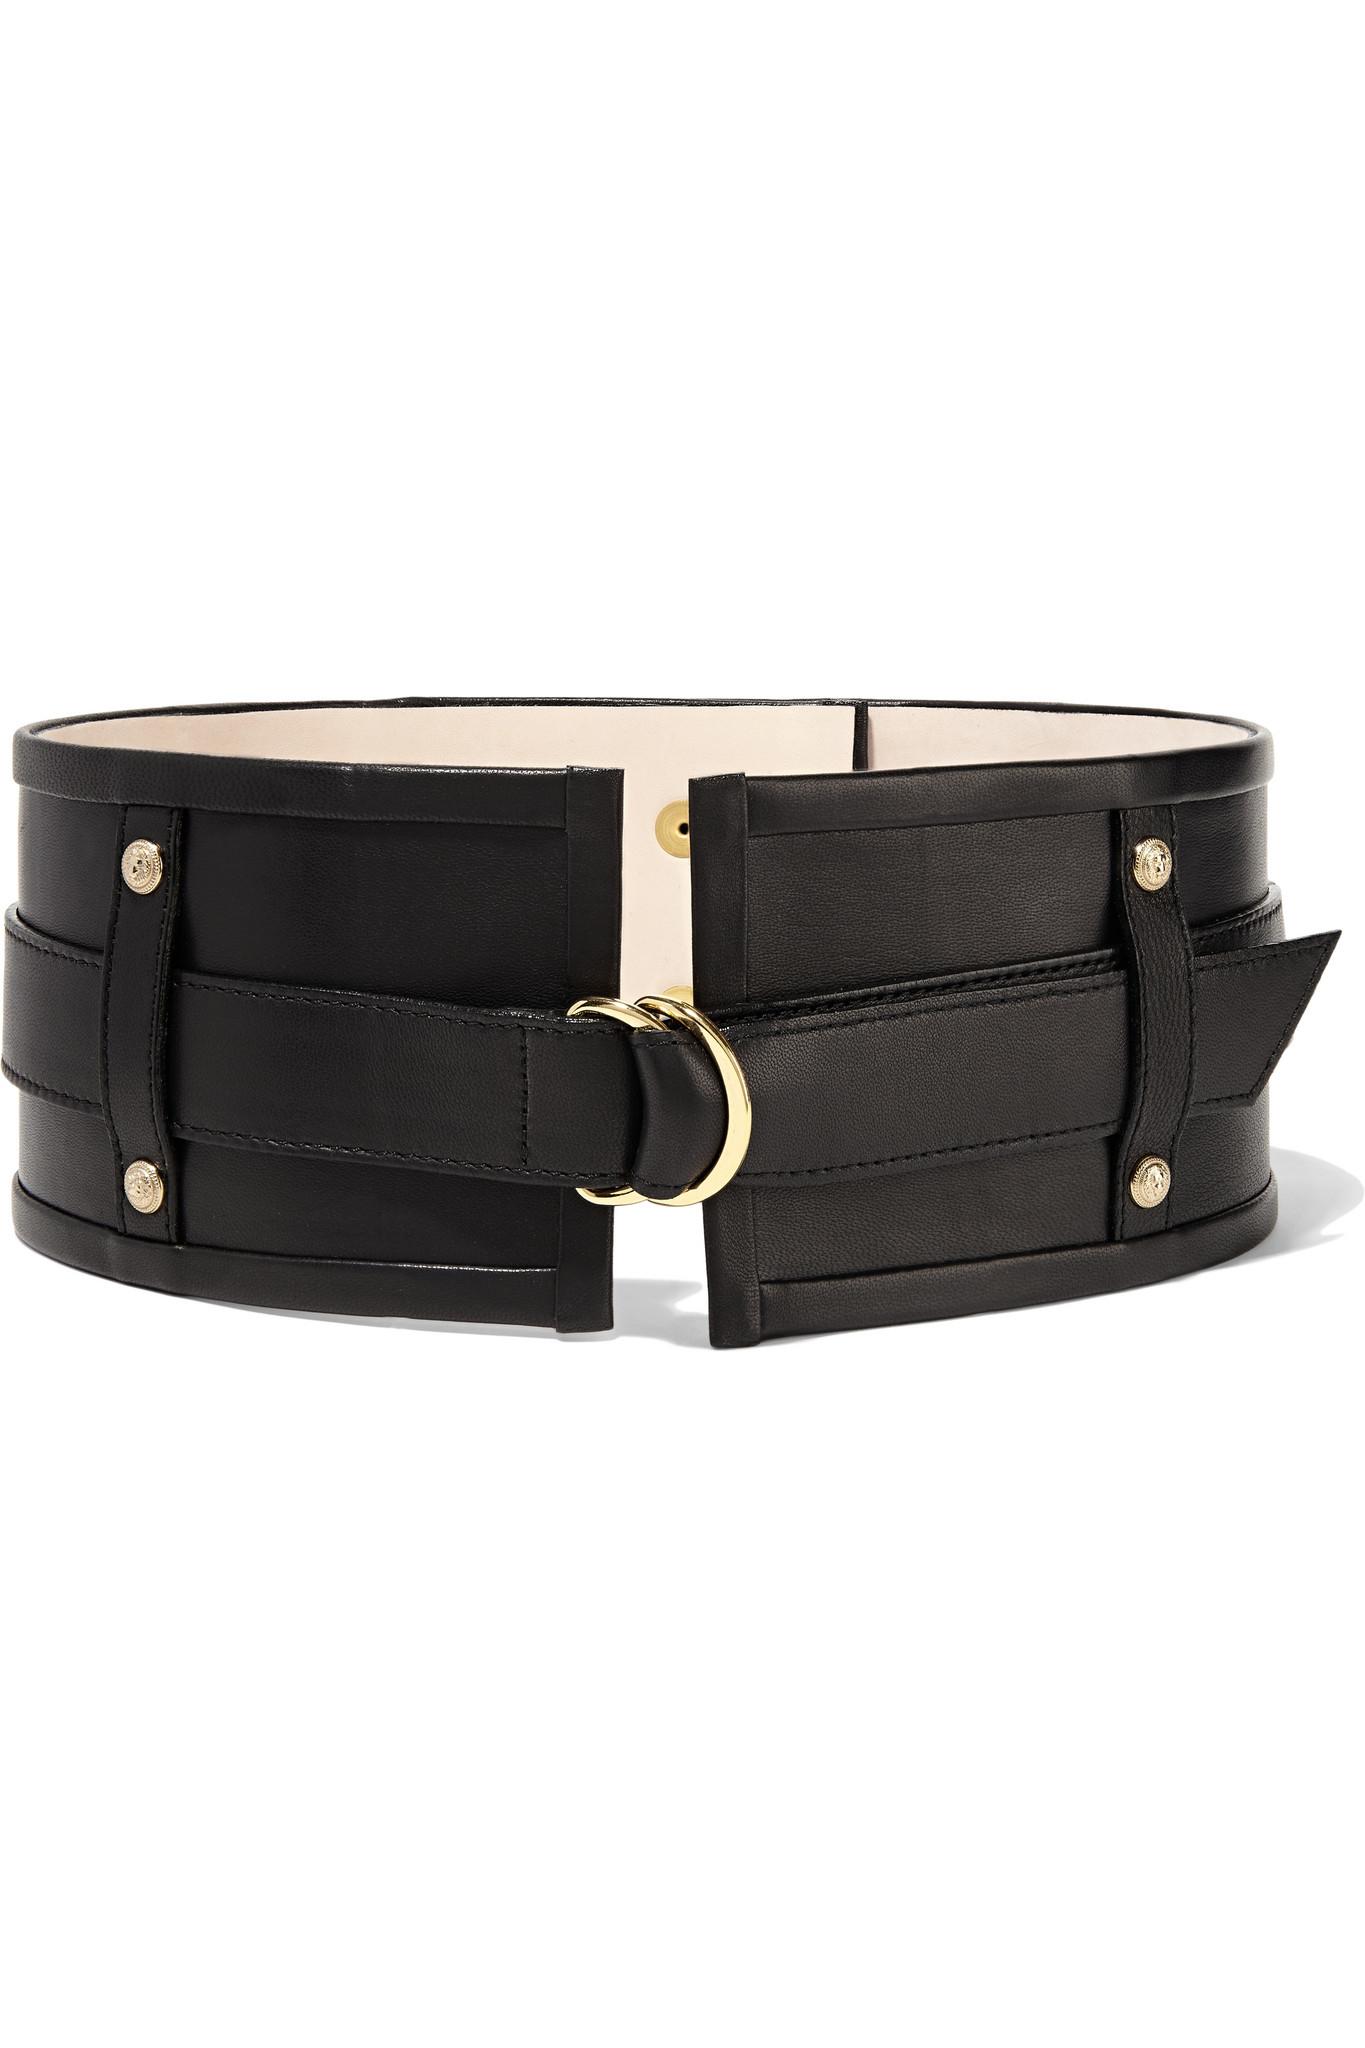 Chain-embellished leather waist belt Balmain hN3SySr840